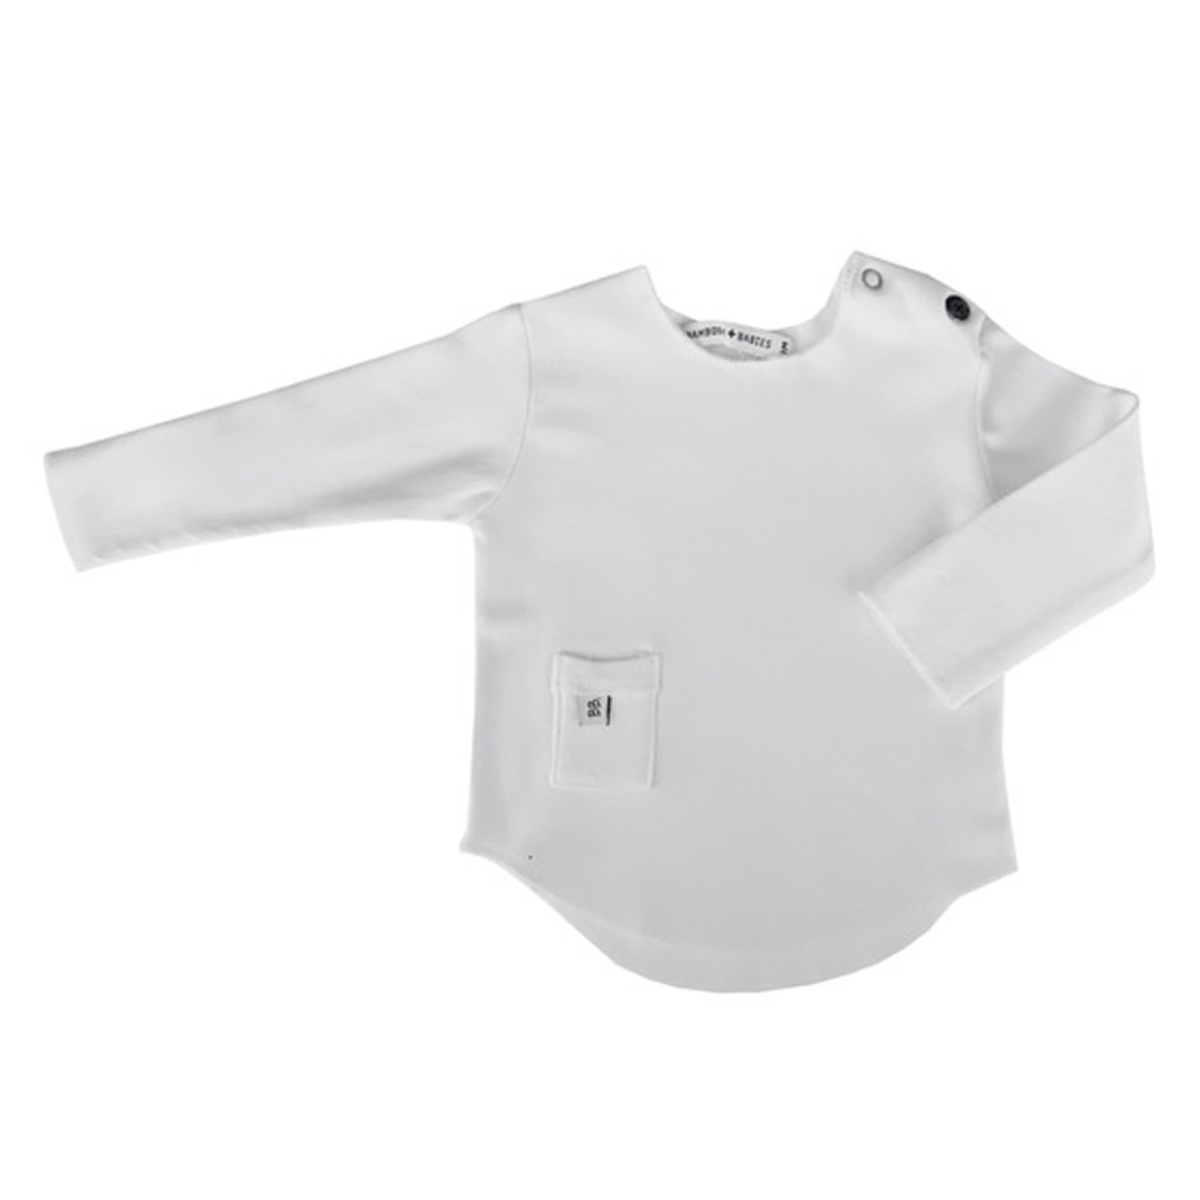 Haut bébé Tee-Shirt Manches Longues Blanc - 9/12 Mois Tee-Shirt Manches Longues Blanc - 9/12 Mois